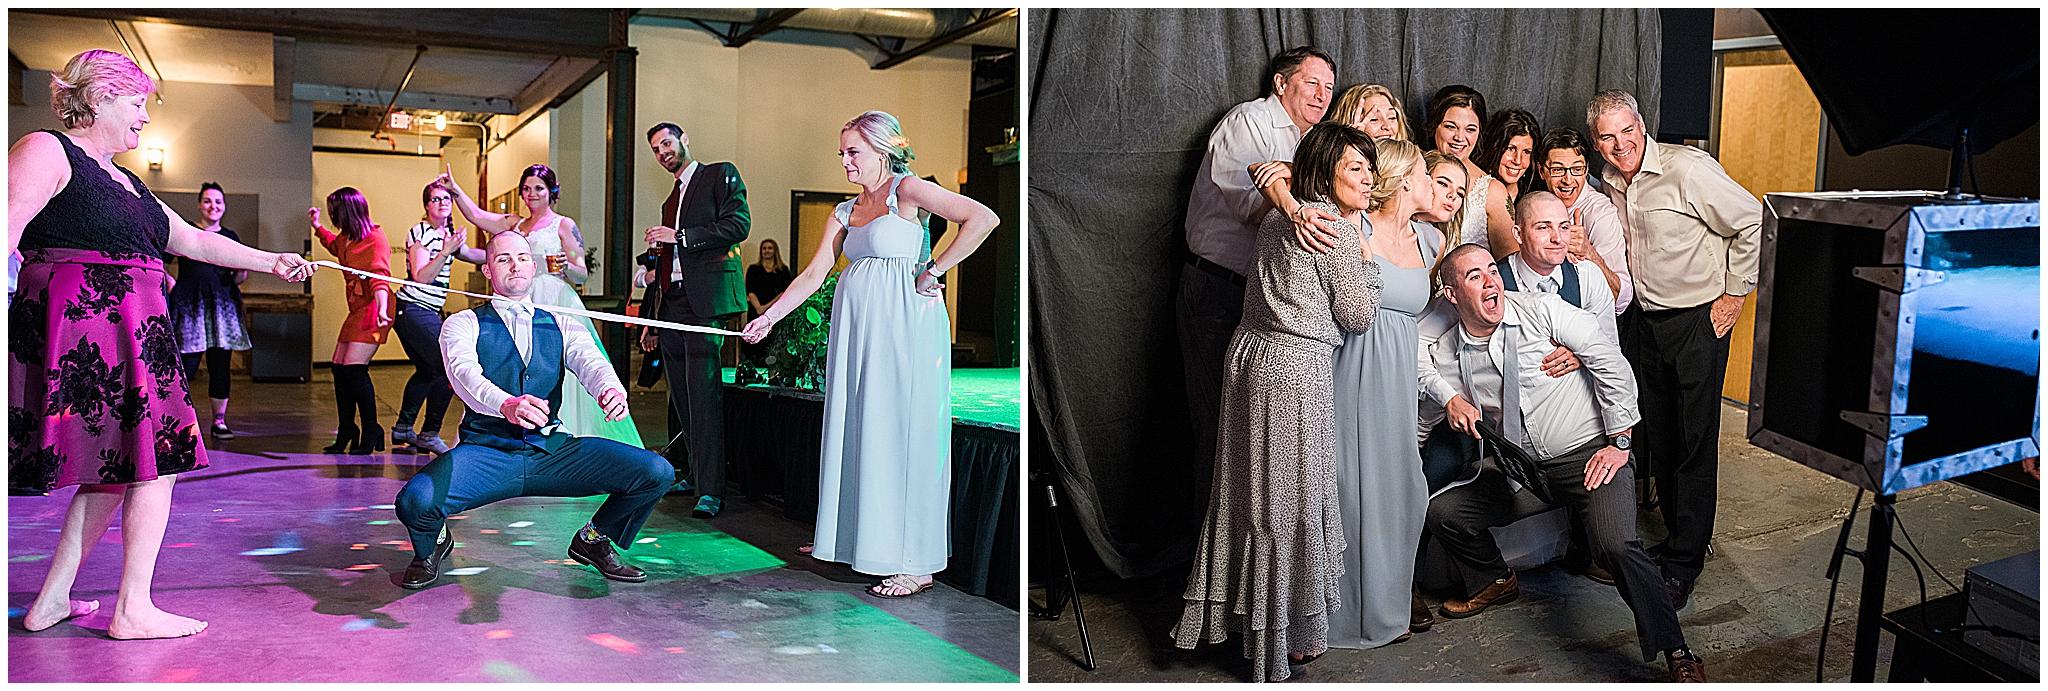 Wedding_Photographer_Asheville_Highland_Brewing_0024.jpg